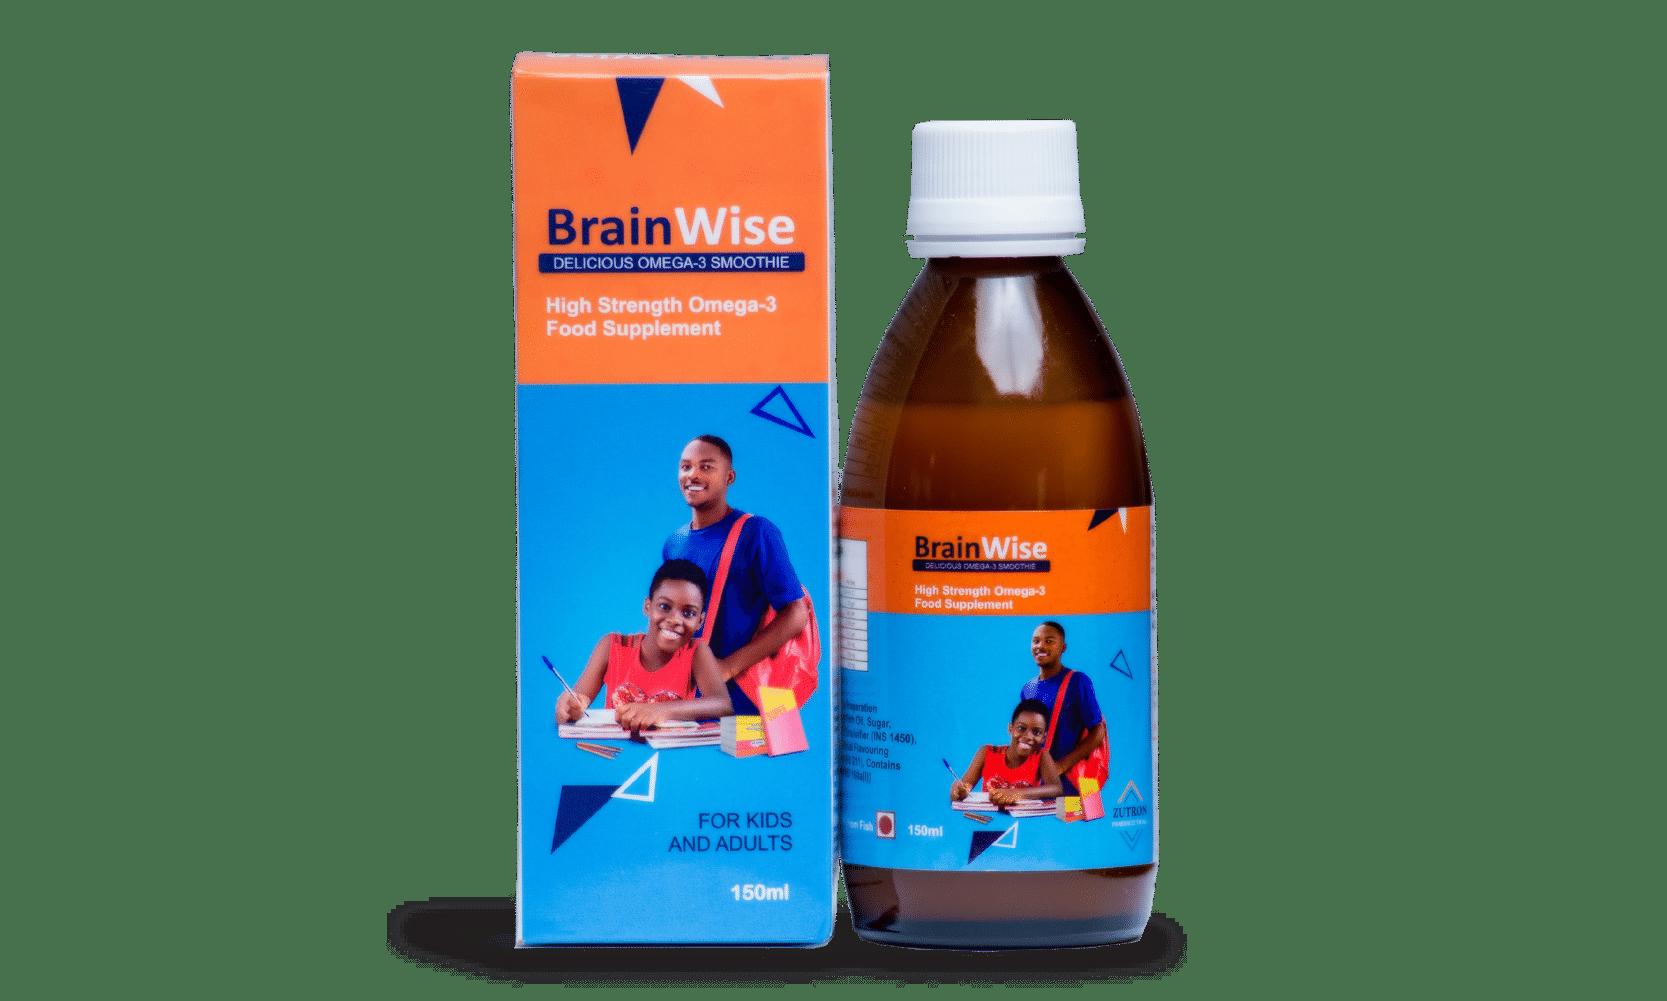 BrainWise